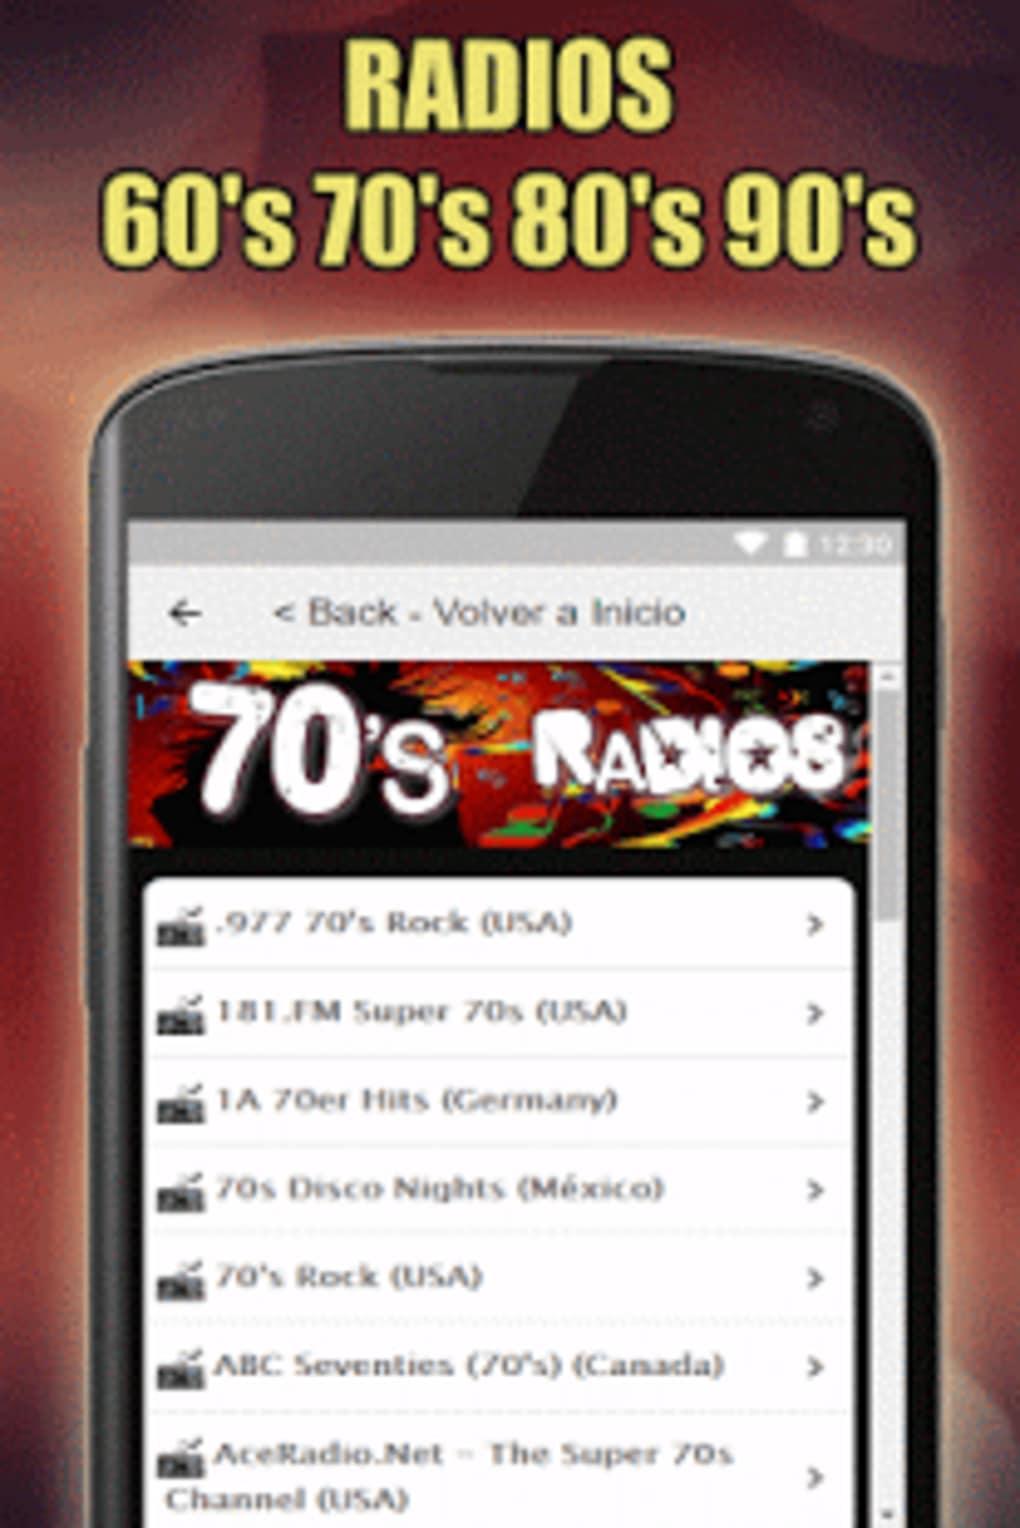 Oldies 60s 70s 80s 90s Radios Retro radios Free for Android